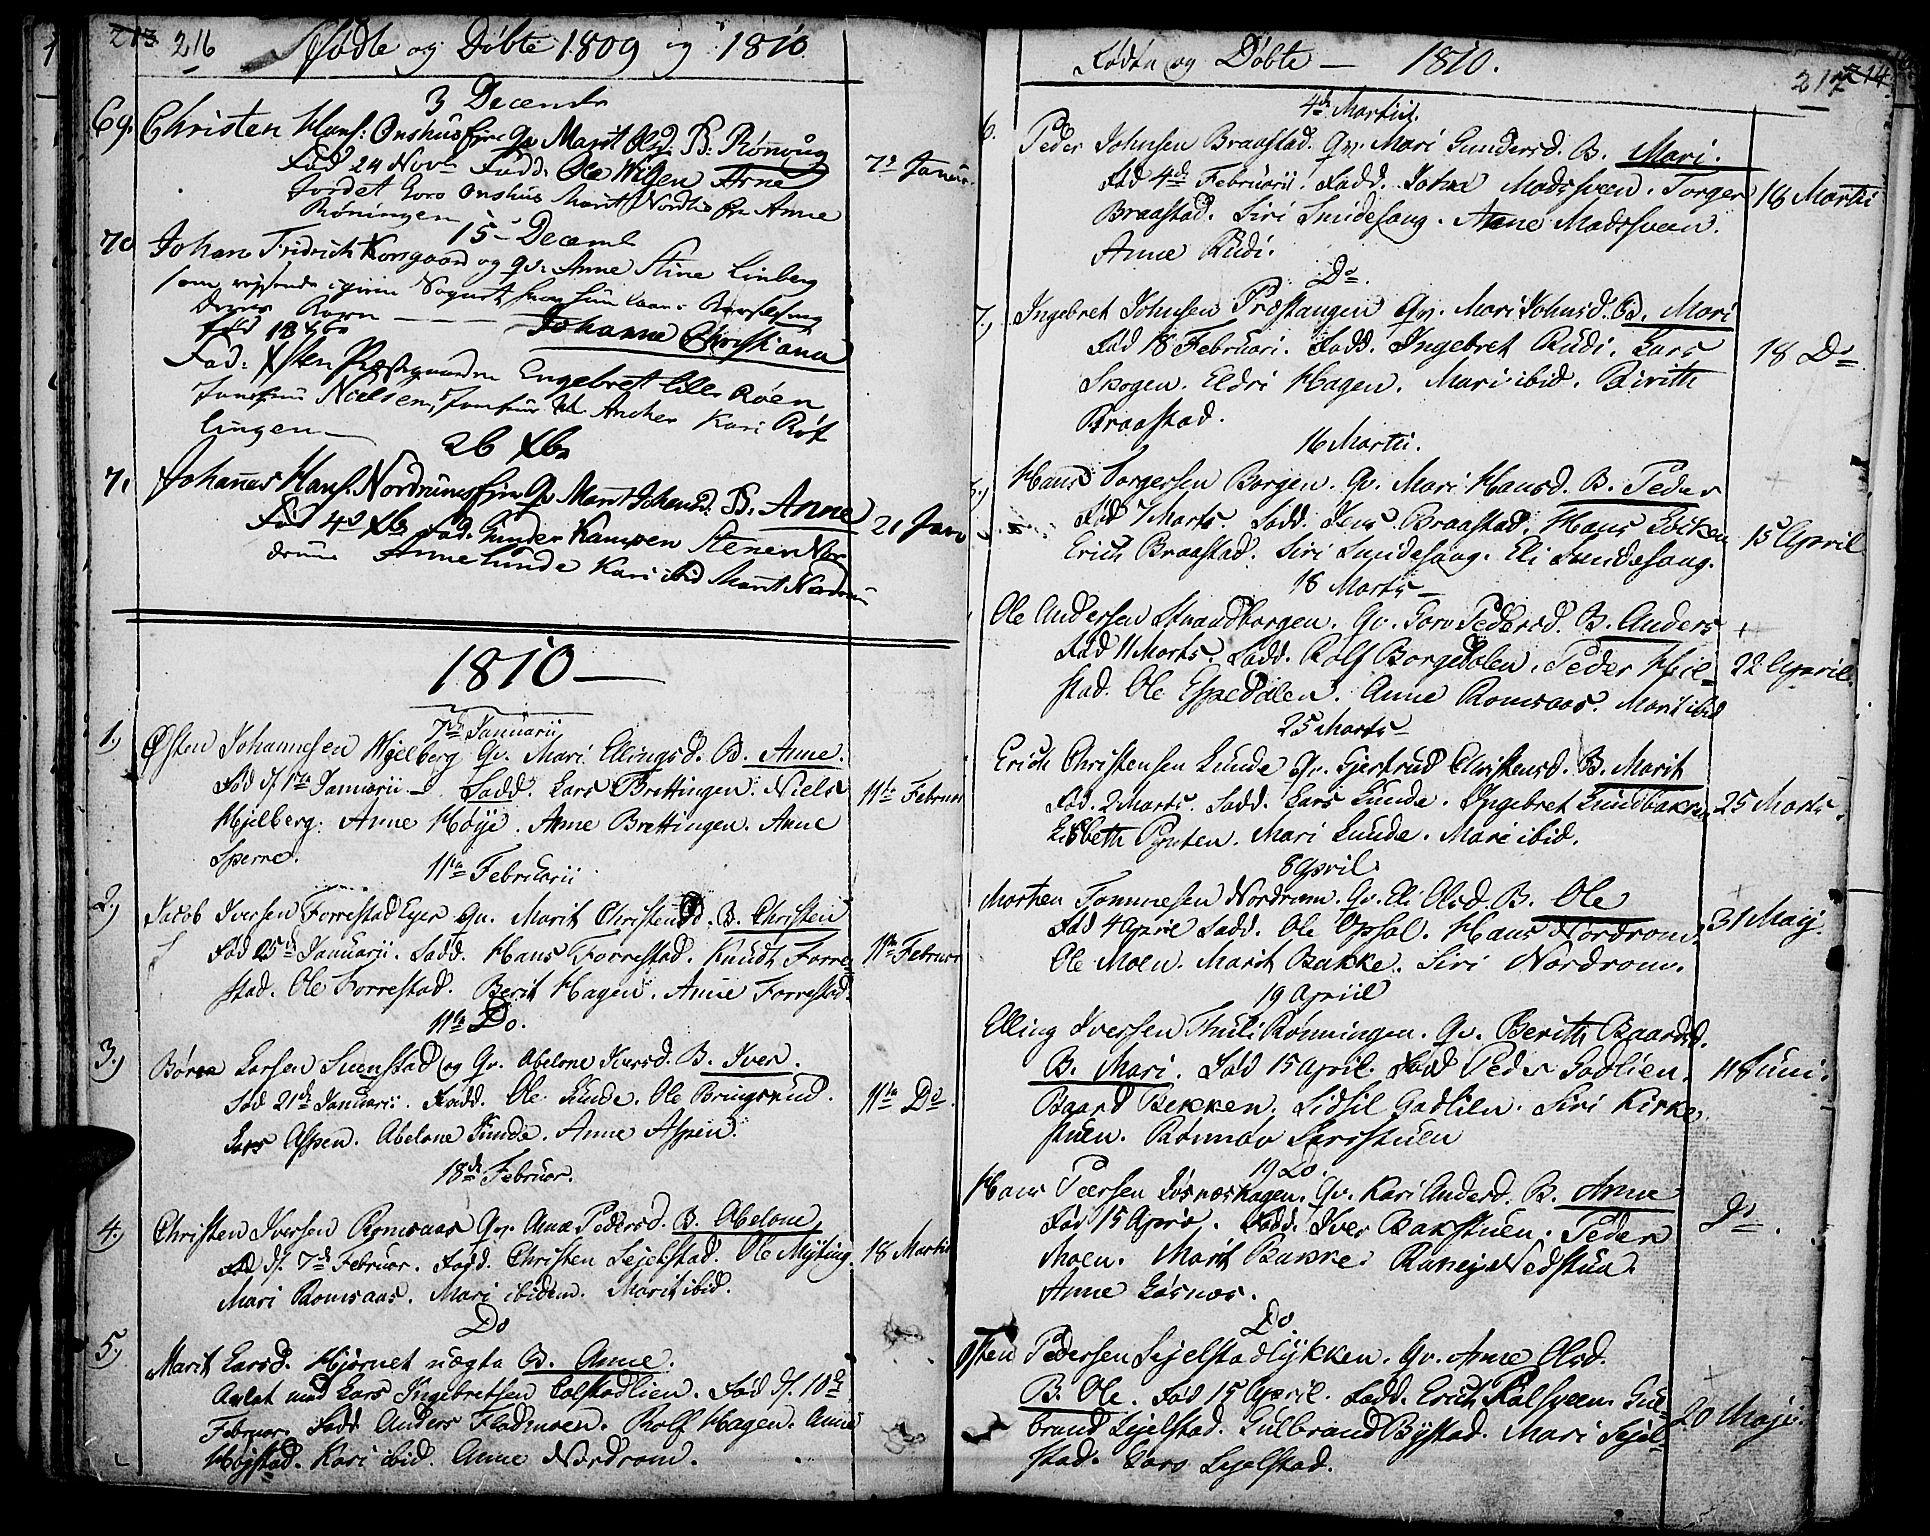 SAH, Ringebu prestekontor, Ministerialbok nr. 3, 1781-1820, s. 216-217